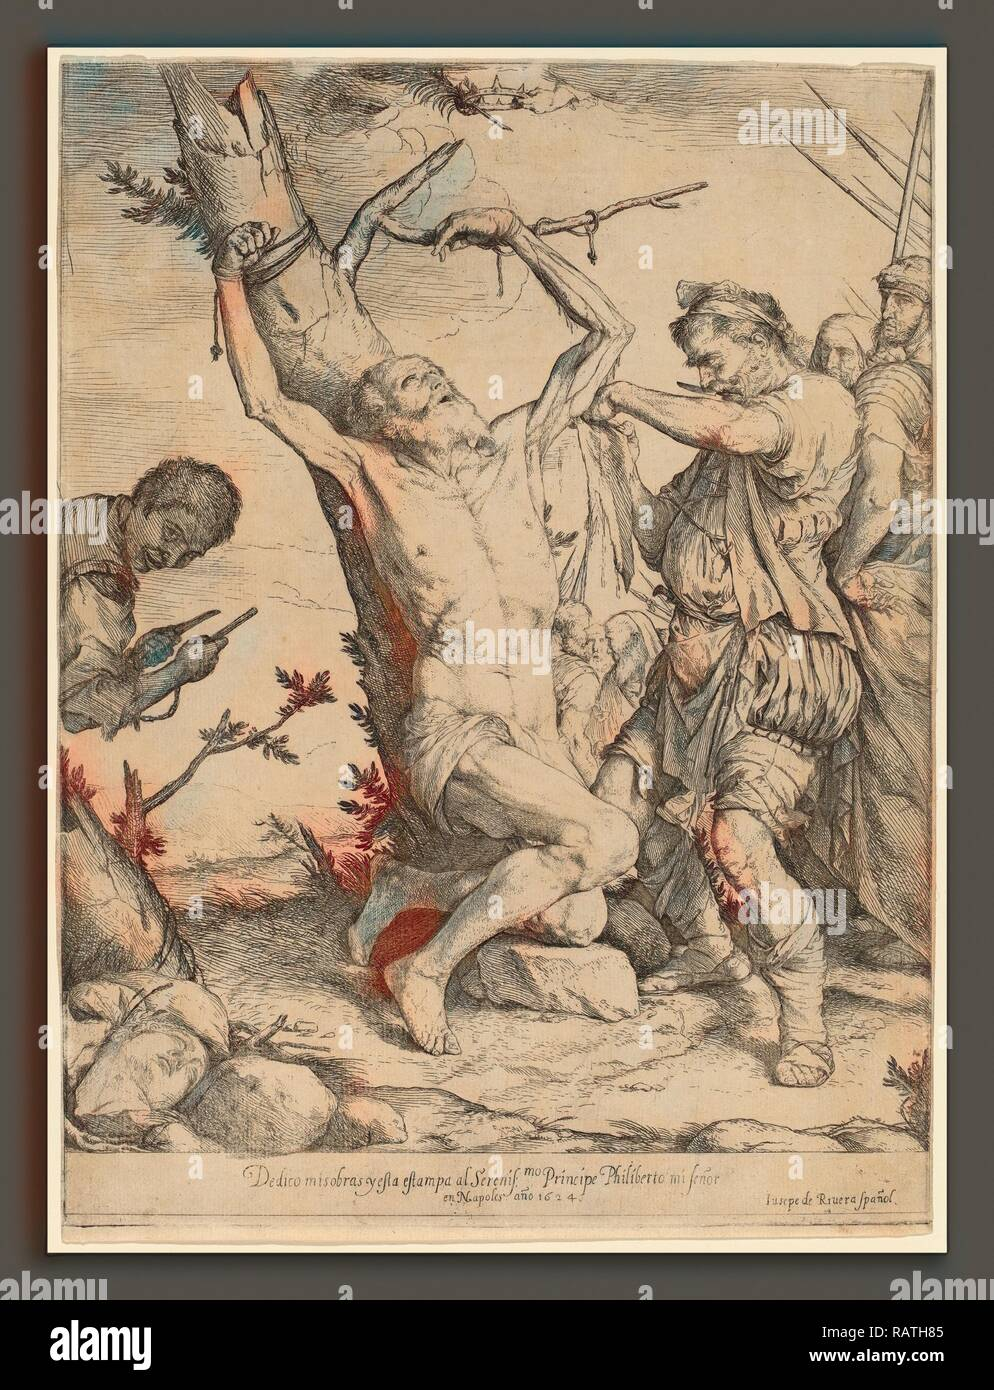 Jusepe de Ribera, The Martyrdom of Saint Bartholomew, Spanish, 1591 - 1652, 1624, etching and engraving. Reimagined - Stock Image